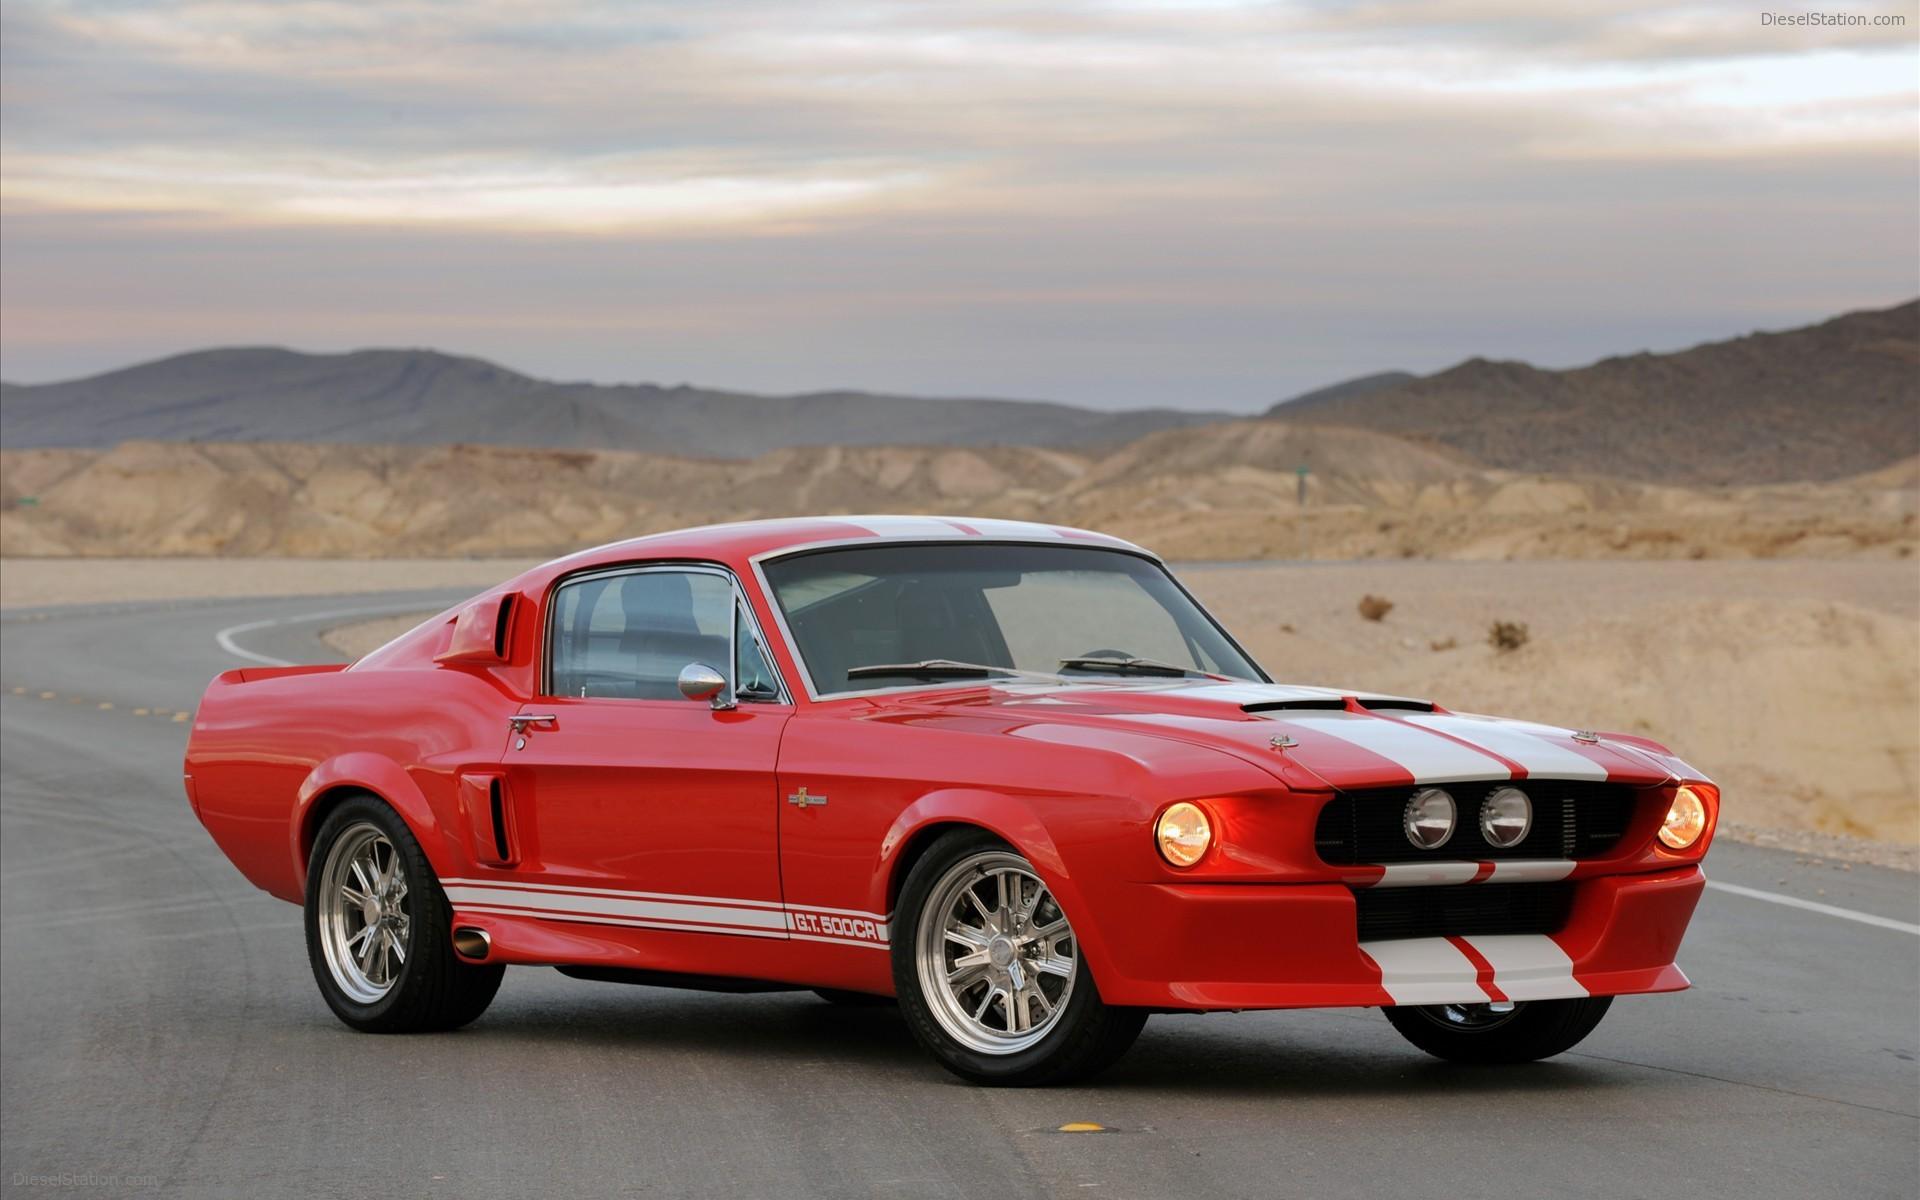 Ford Mustang 1967 Wallpaper